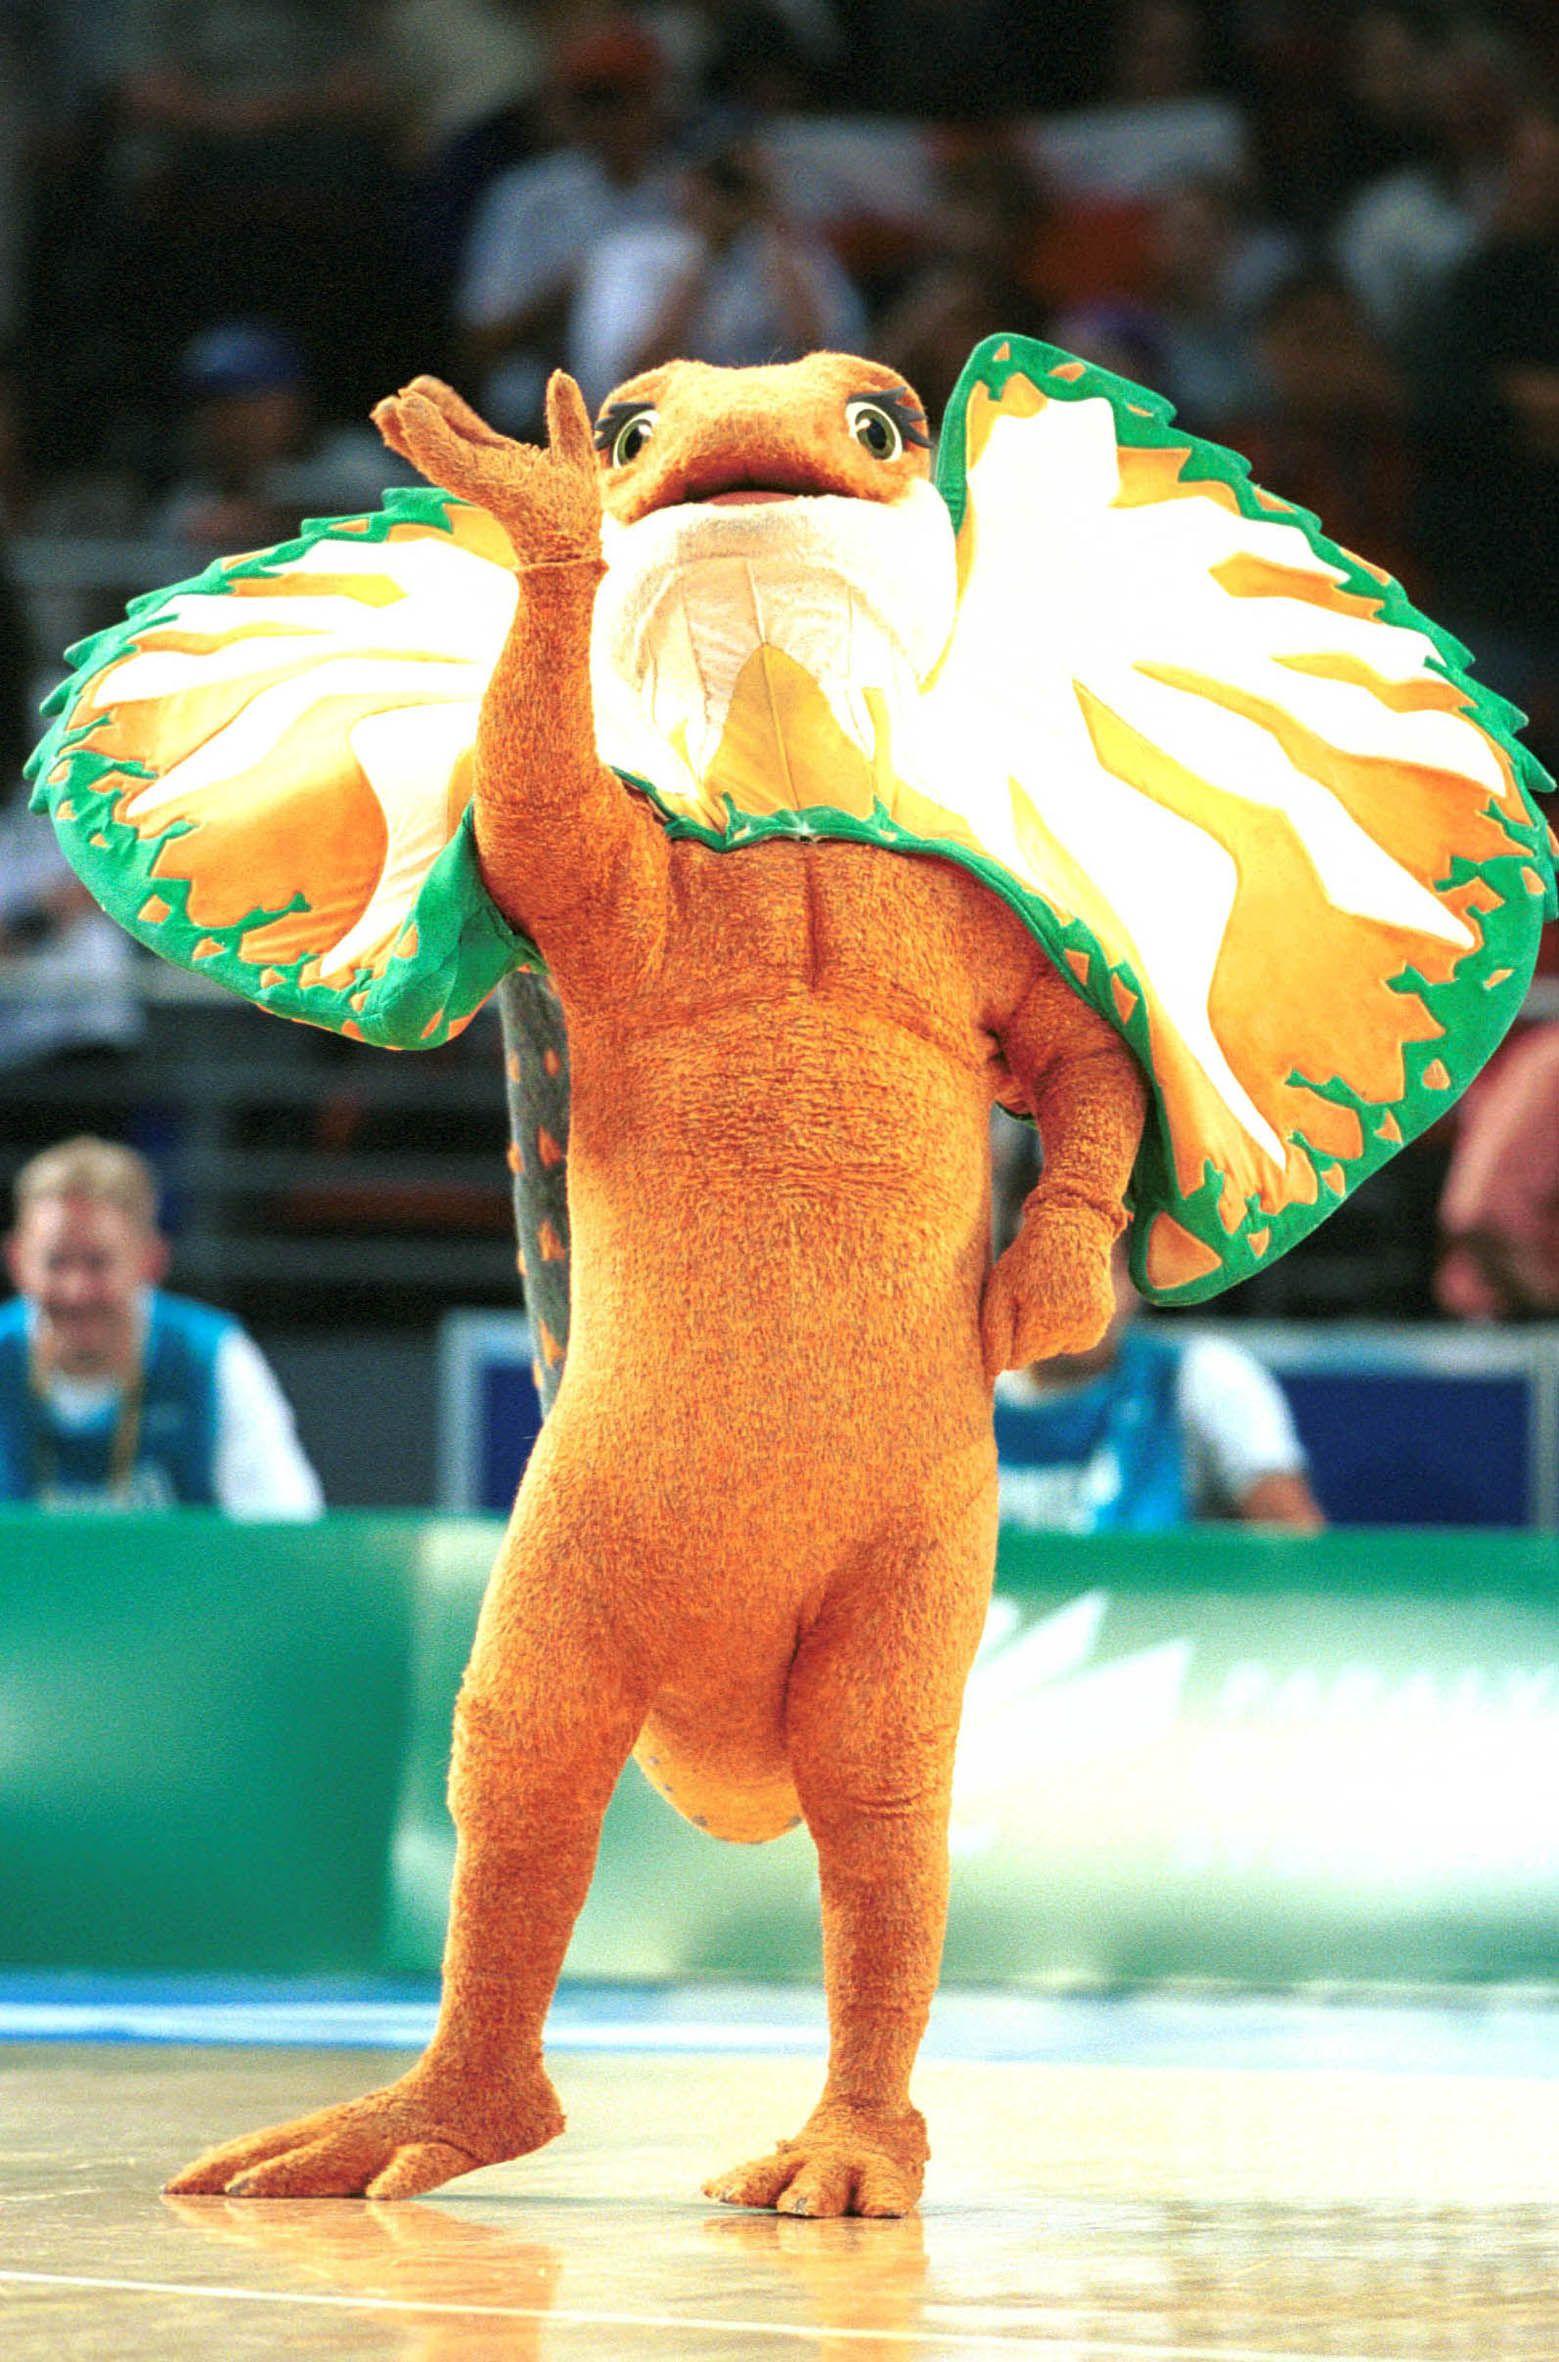 Sydney Paralympic Mascot Lizzie The Frilled Neck Lizard Summer OlympicsMy ChildhoodSydneyKawaiiKawaii CuteOlympic Games